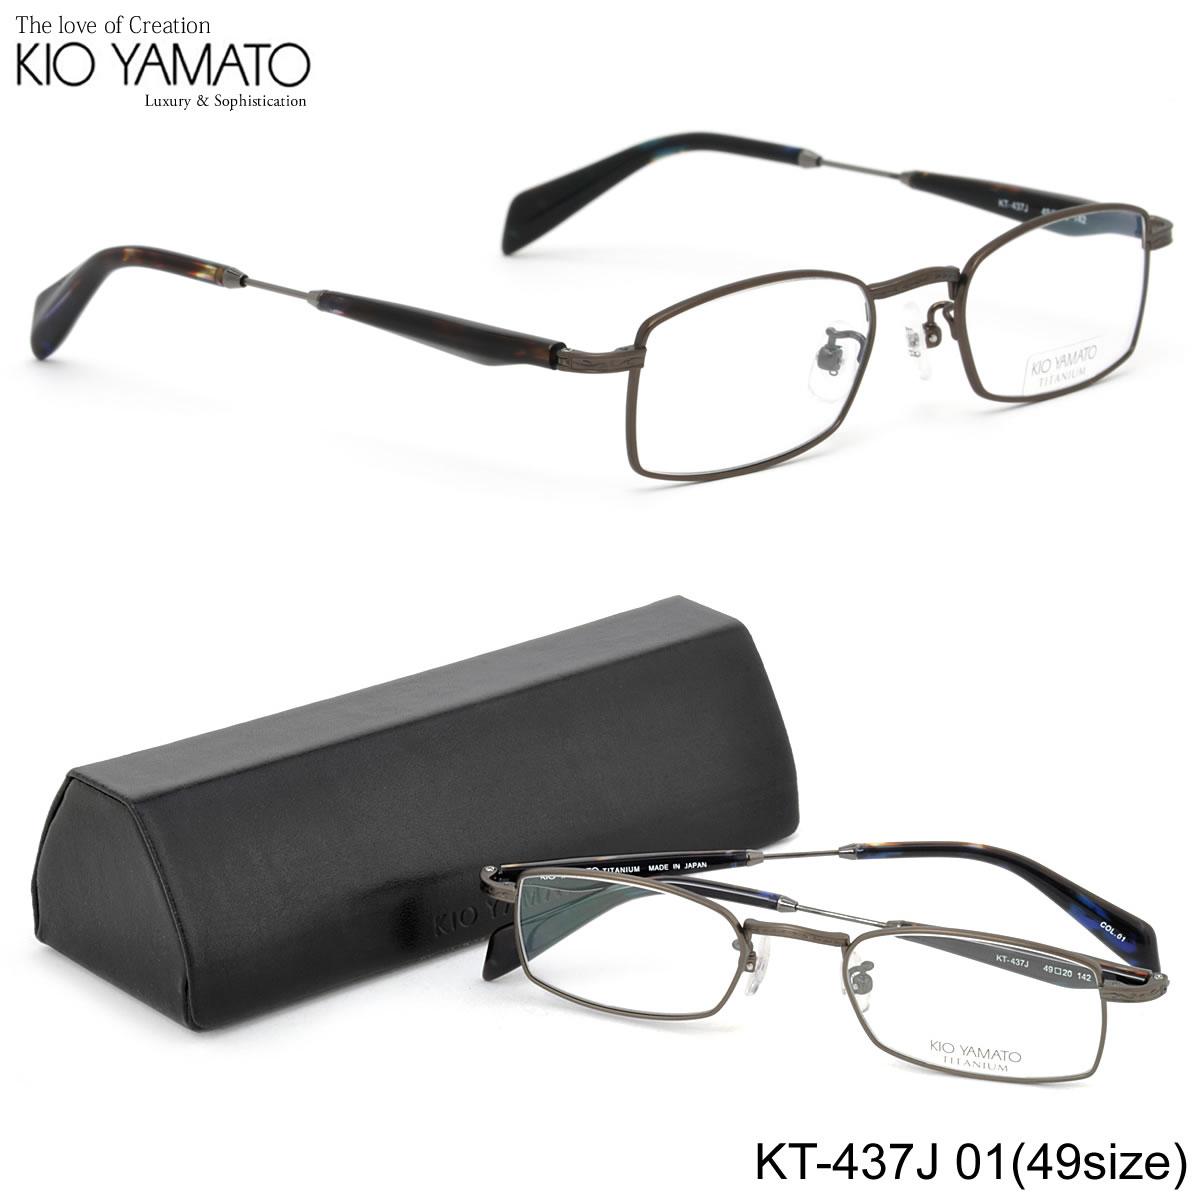 KIO YAMATO キオヤマト メガネ フレーム KT-437J 01 49サイズ ペンタゴン チタン 日本製 眼鏡 キオヤマト KIO YAMATO メンズ レディース